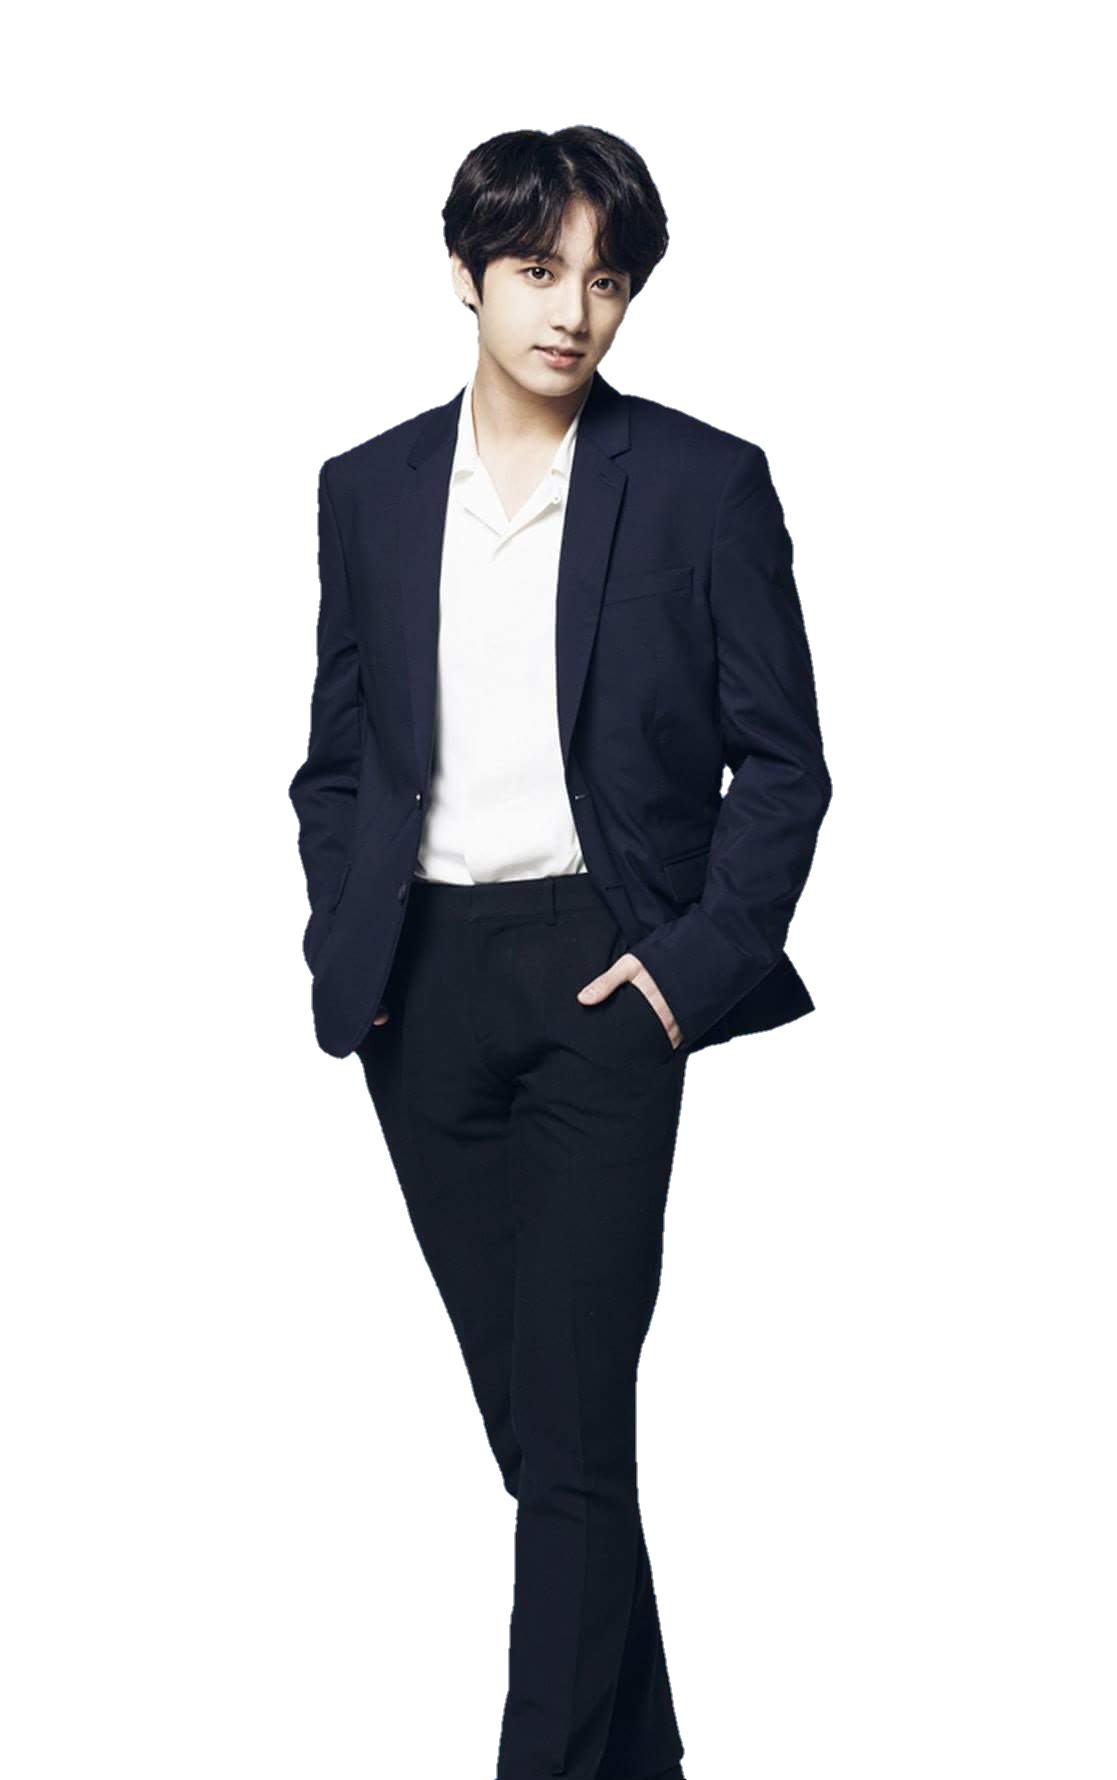 Akarlak Teged Bts Jungkook Jungkook Bts Concept Photo